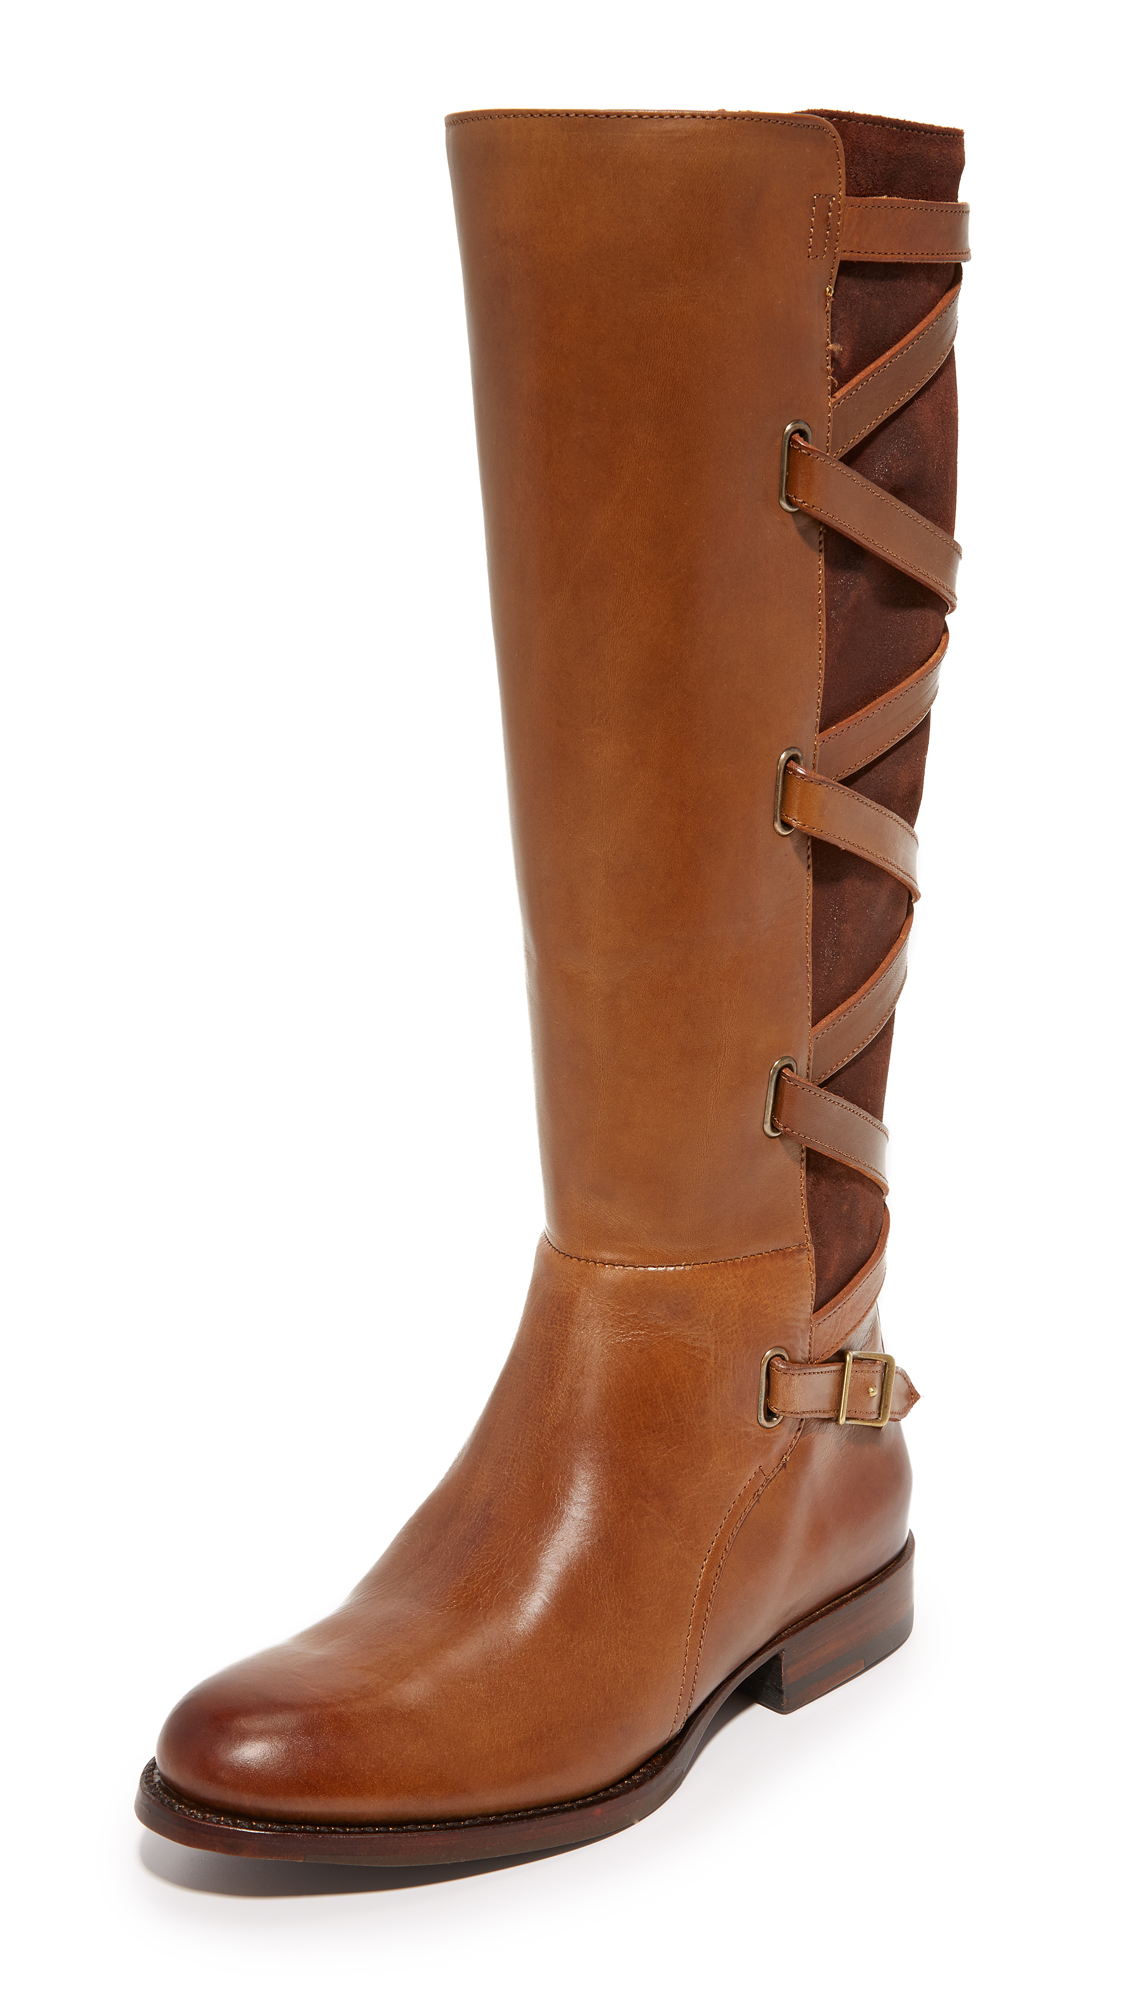 Frye Jordan Strappy Tall Boots - Wood at Shopbop